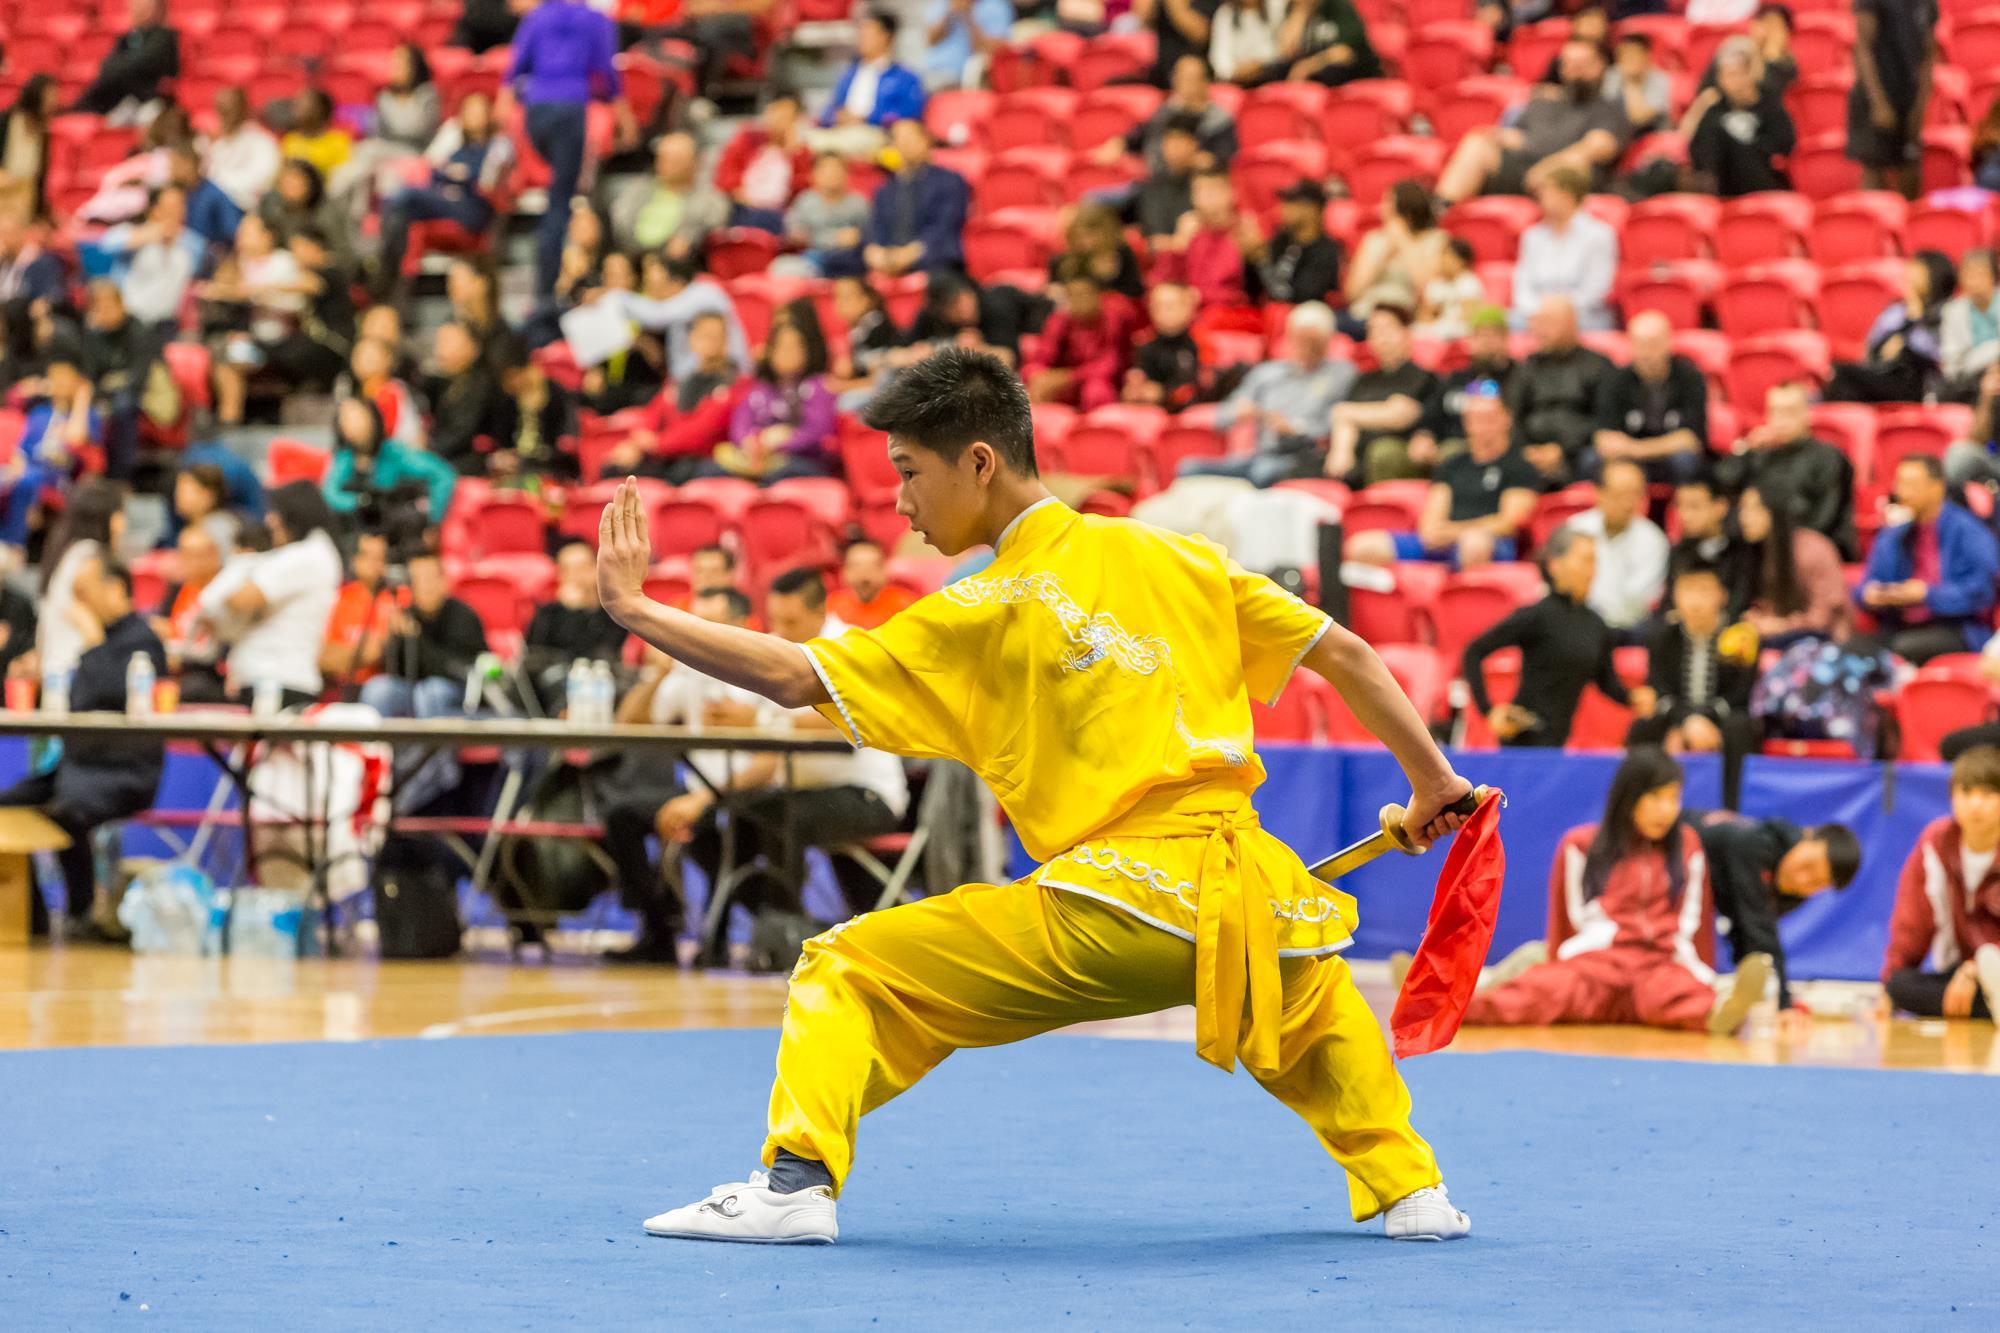 wayland-li-wushu-toronto-markham-canadian-wushu-championships-2017-daoshu-6.jpg